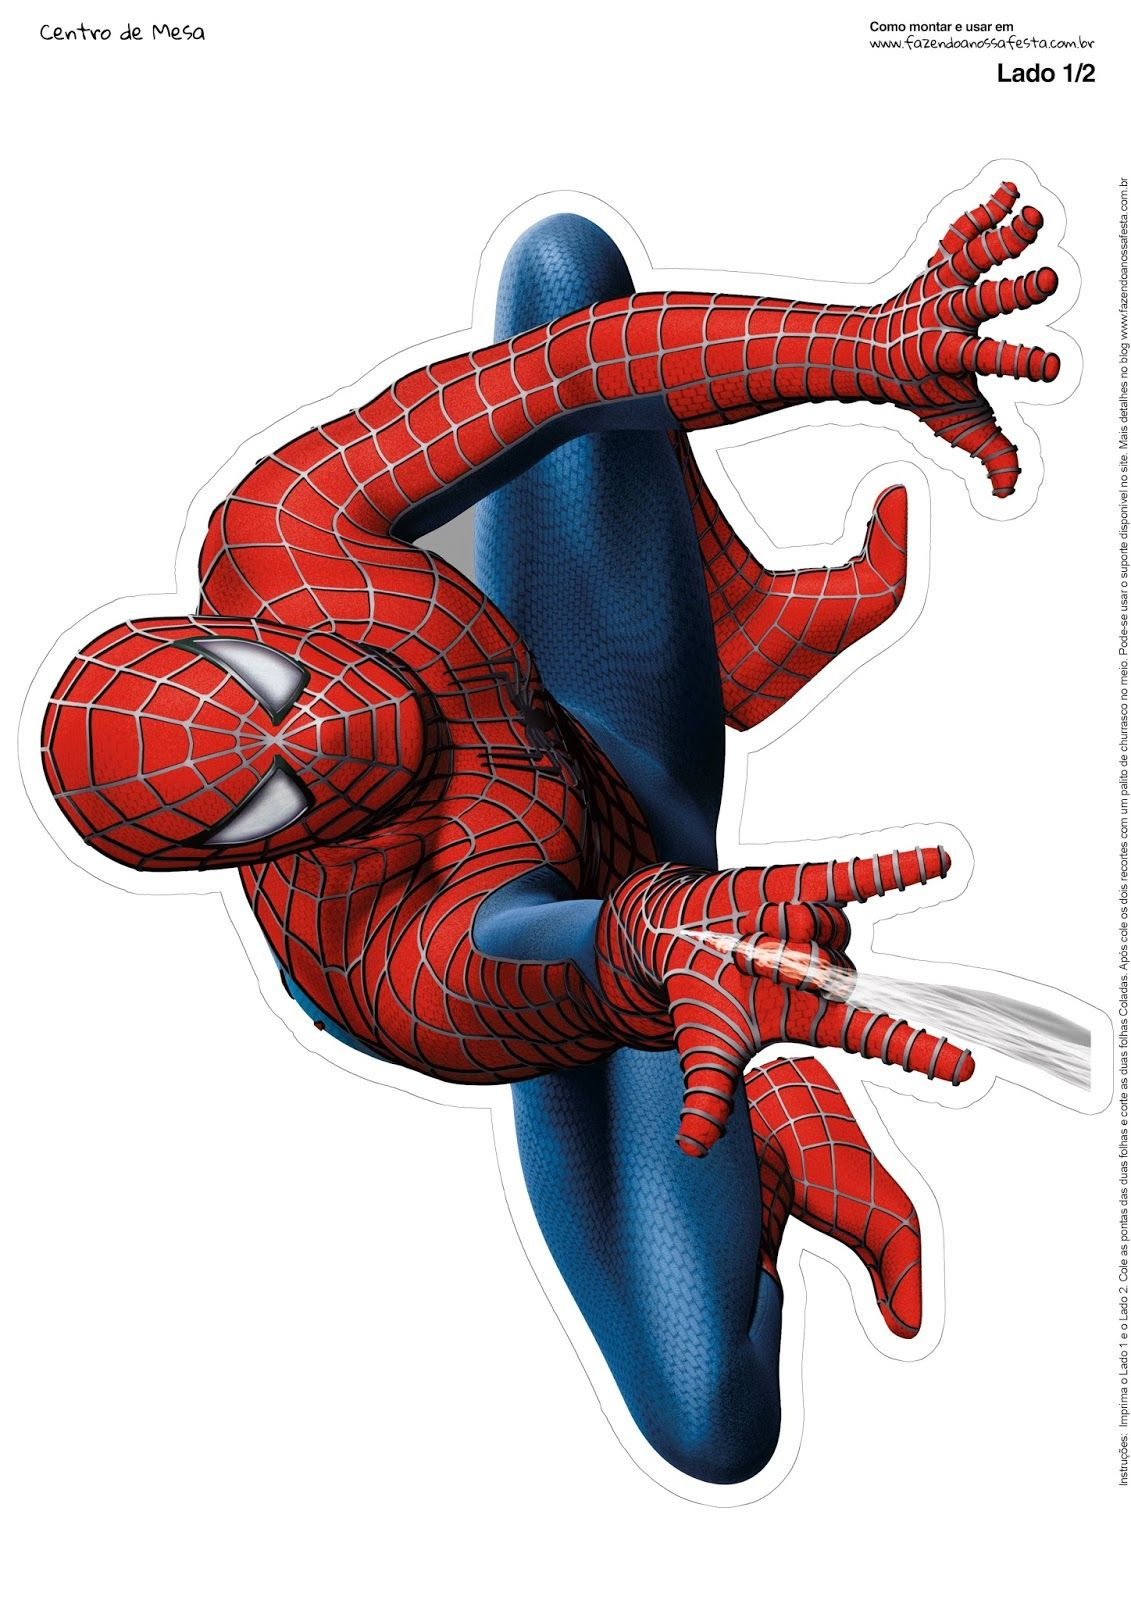 Spiderman Free Printable Centerpiece. Spiderman